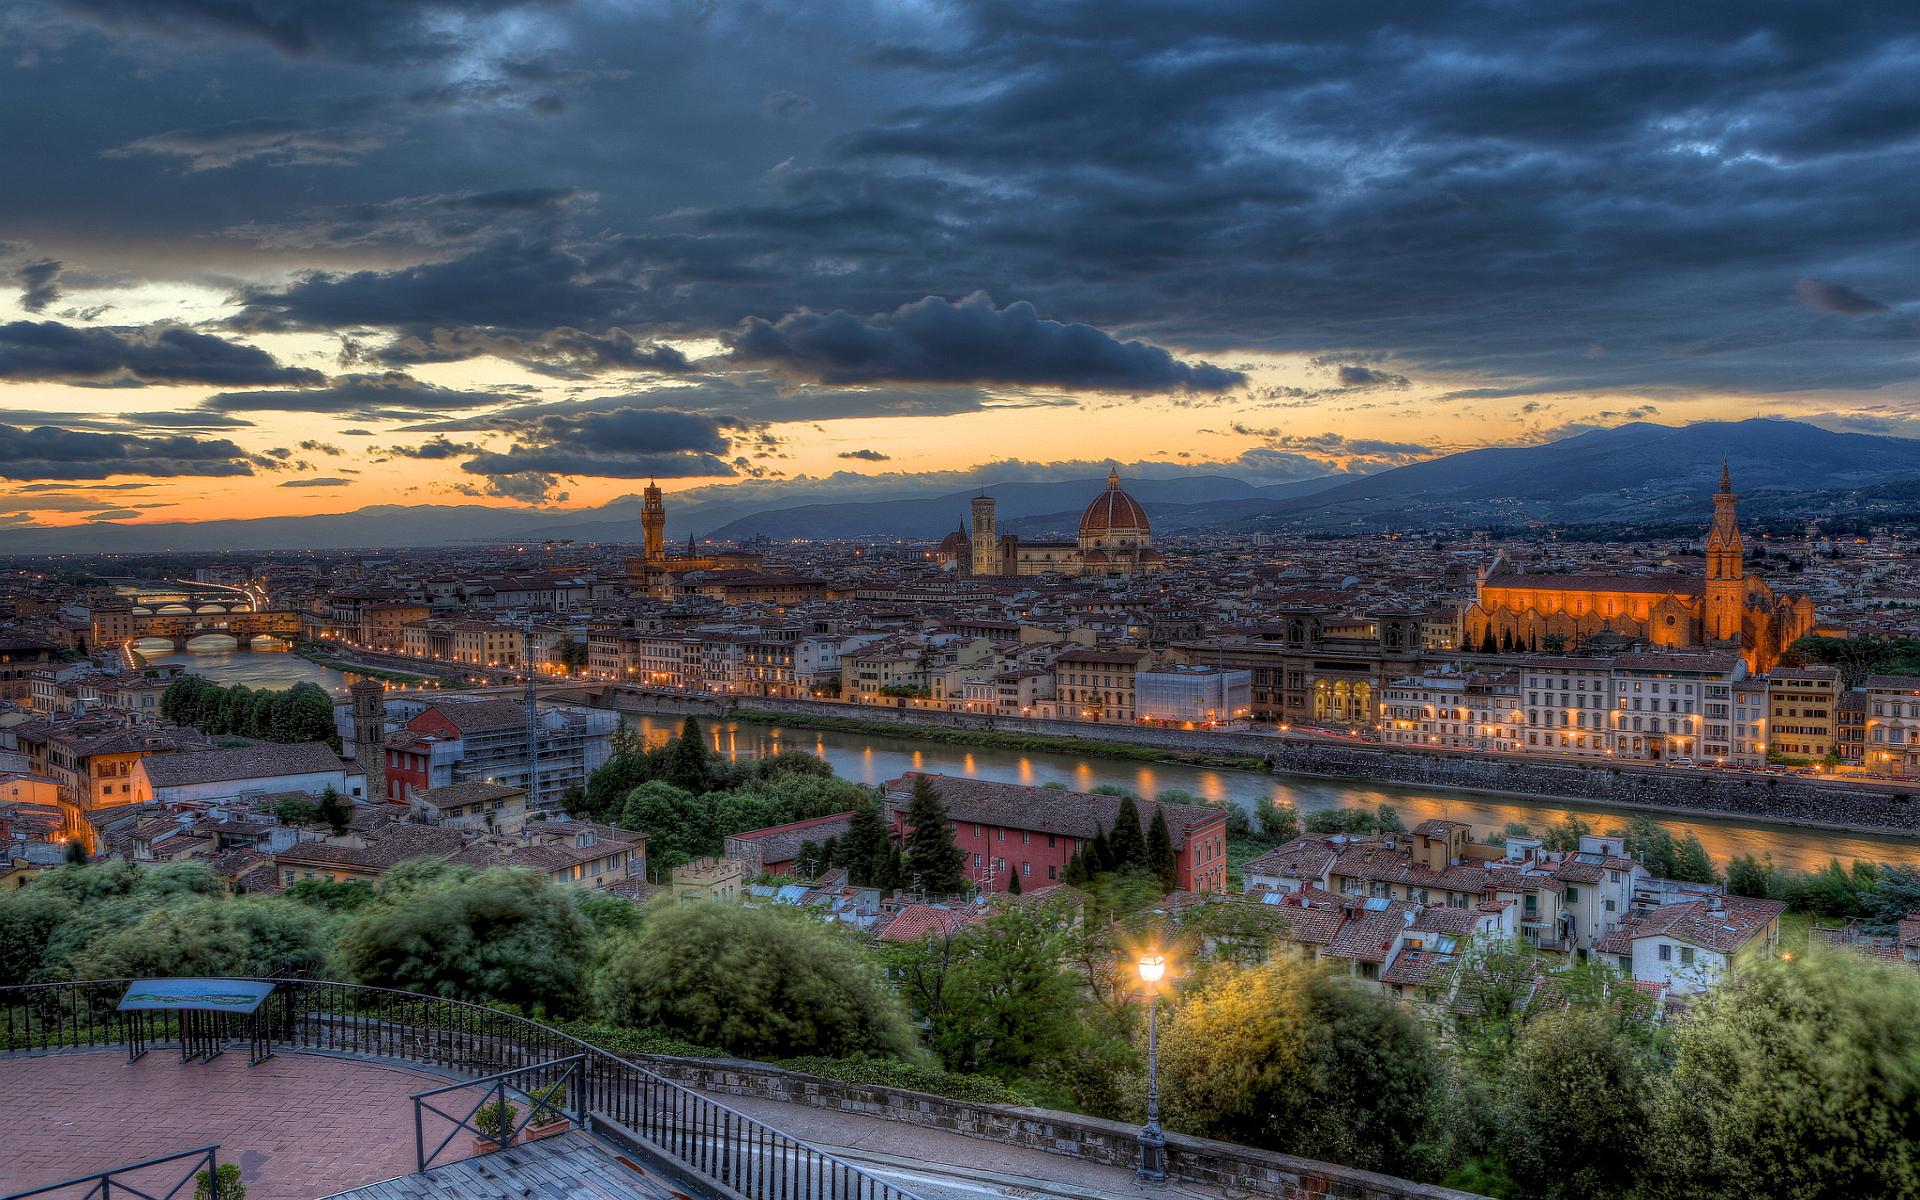 Florence Wallpaper · Florence Wallpaper · Florence Wallpaper · Florence Wallpaper ...